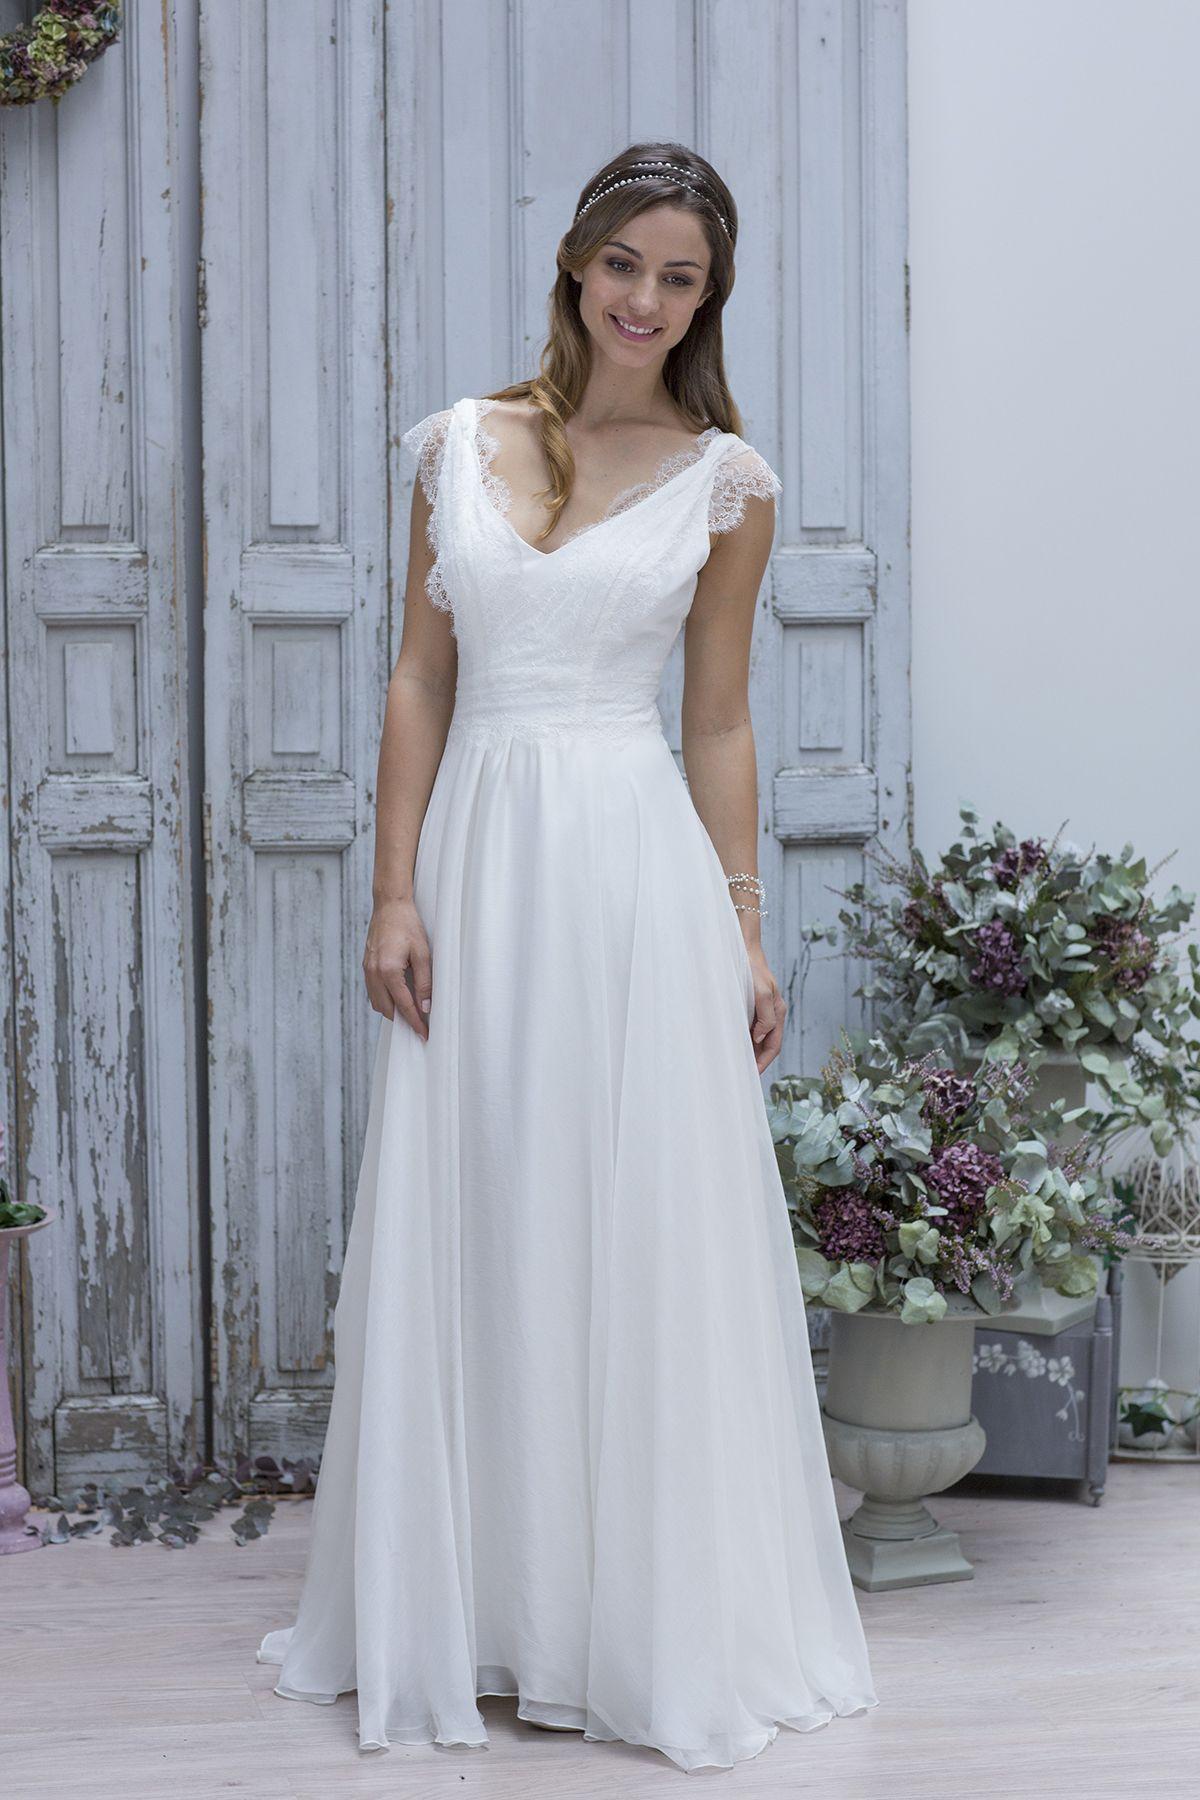 Robe de Mariée : Marie Laporte 2014 | Pinterest | Escote, De novia y ...